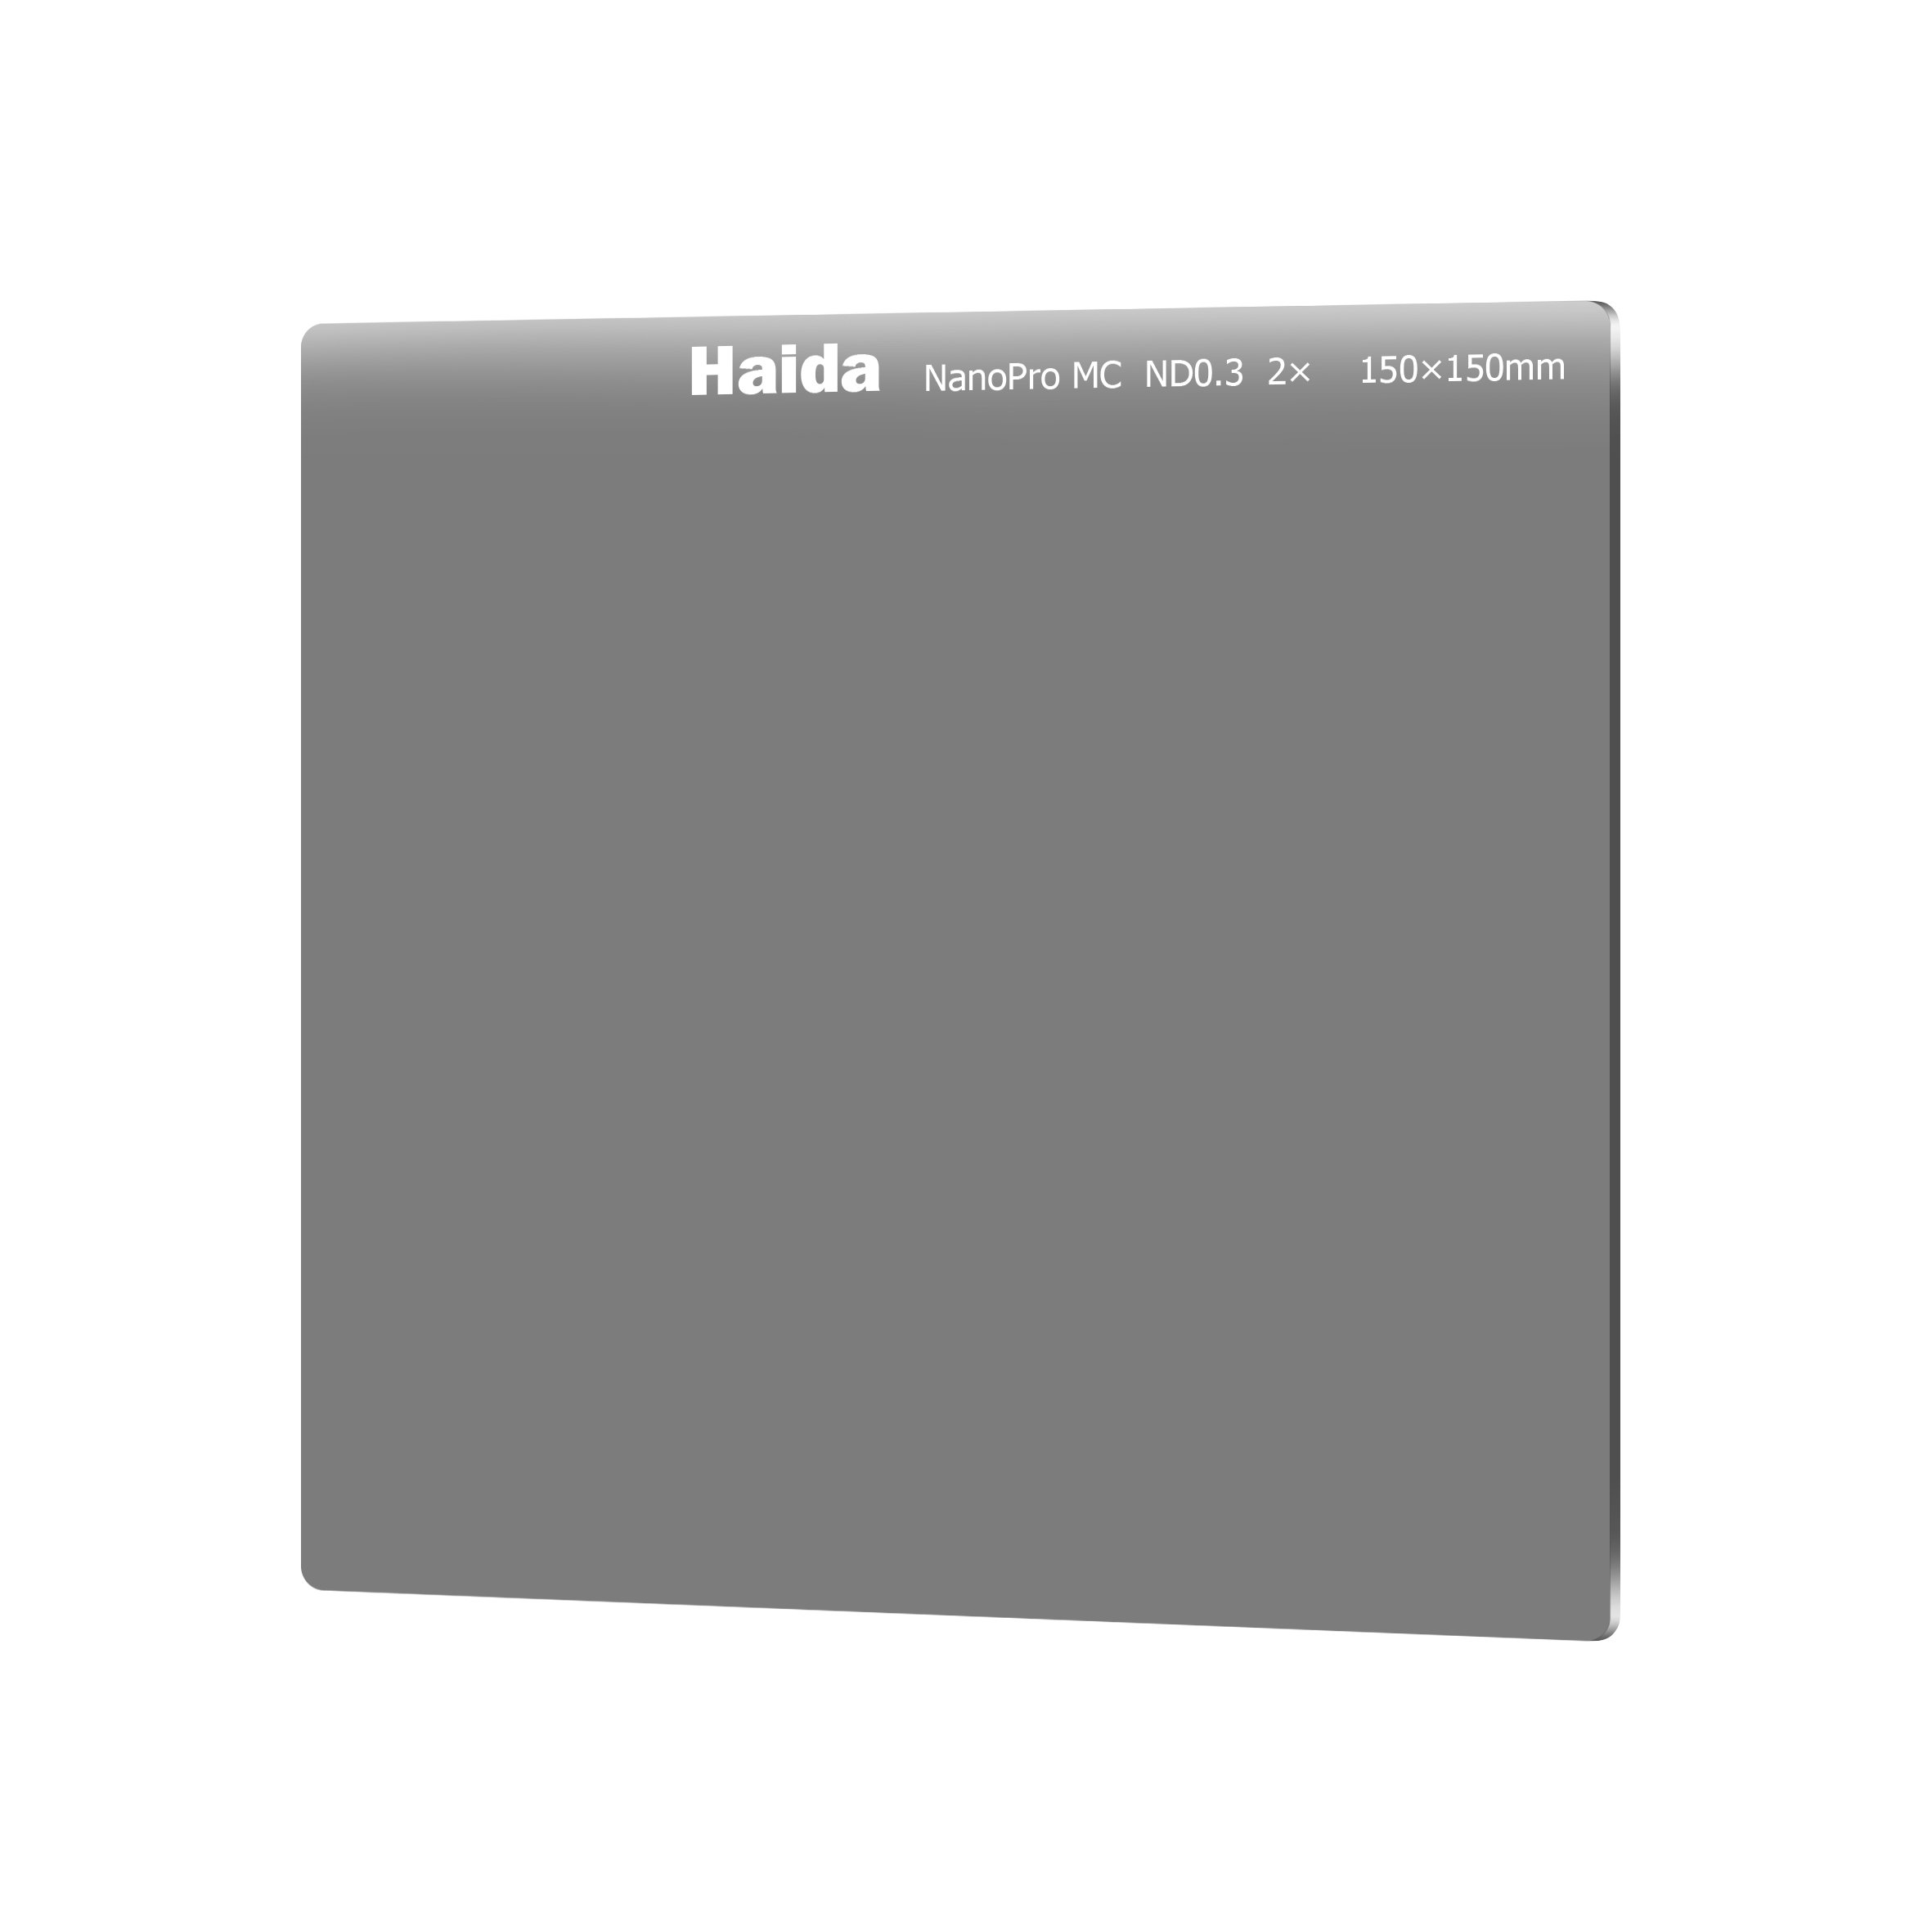 Haida NanoPro 150mm MC Neutral Density ND2 ND 0.3 Optical Glass Filter 150 1 Stop HD3320